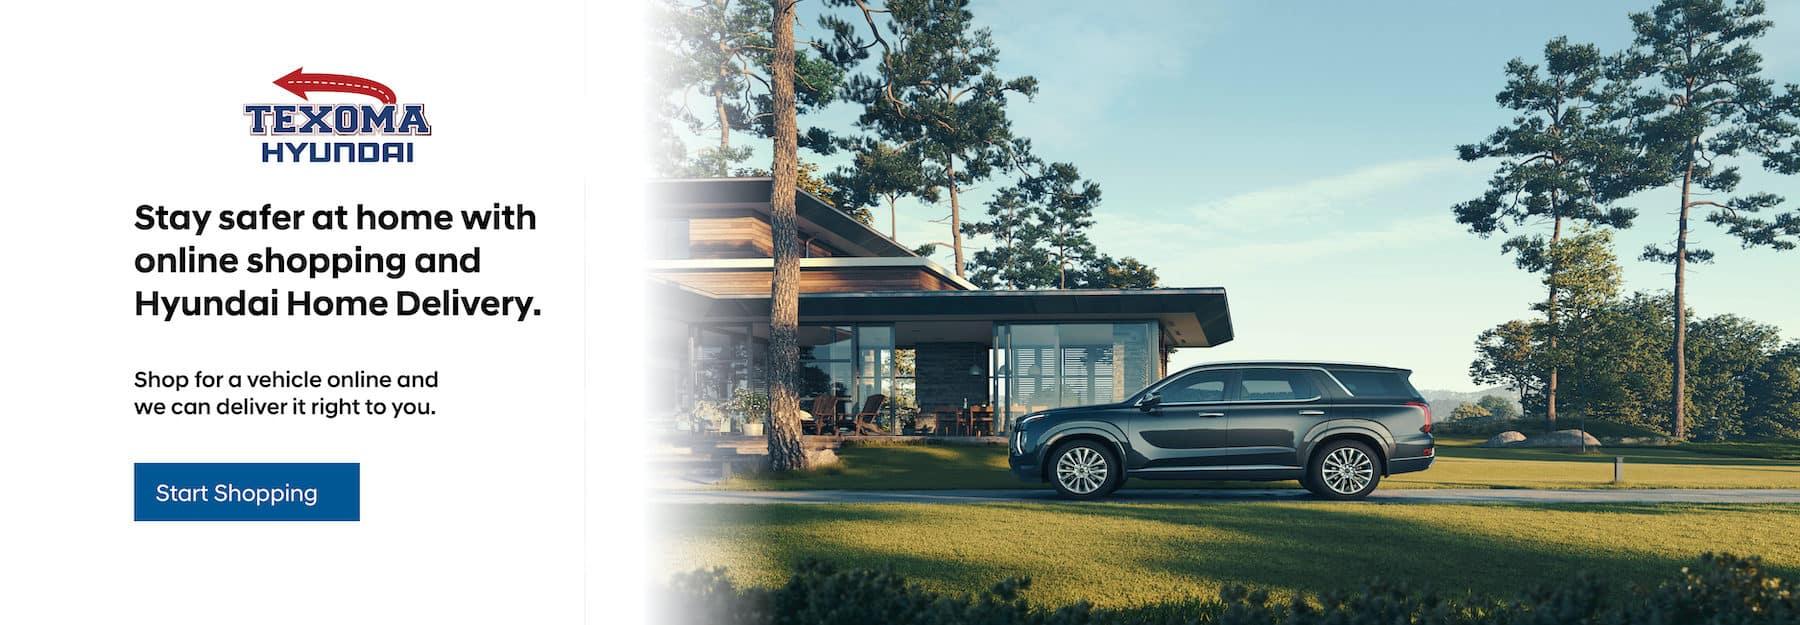 Buy Online Texoma Hyundai